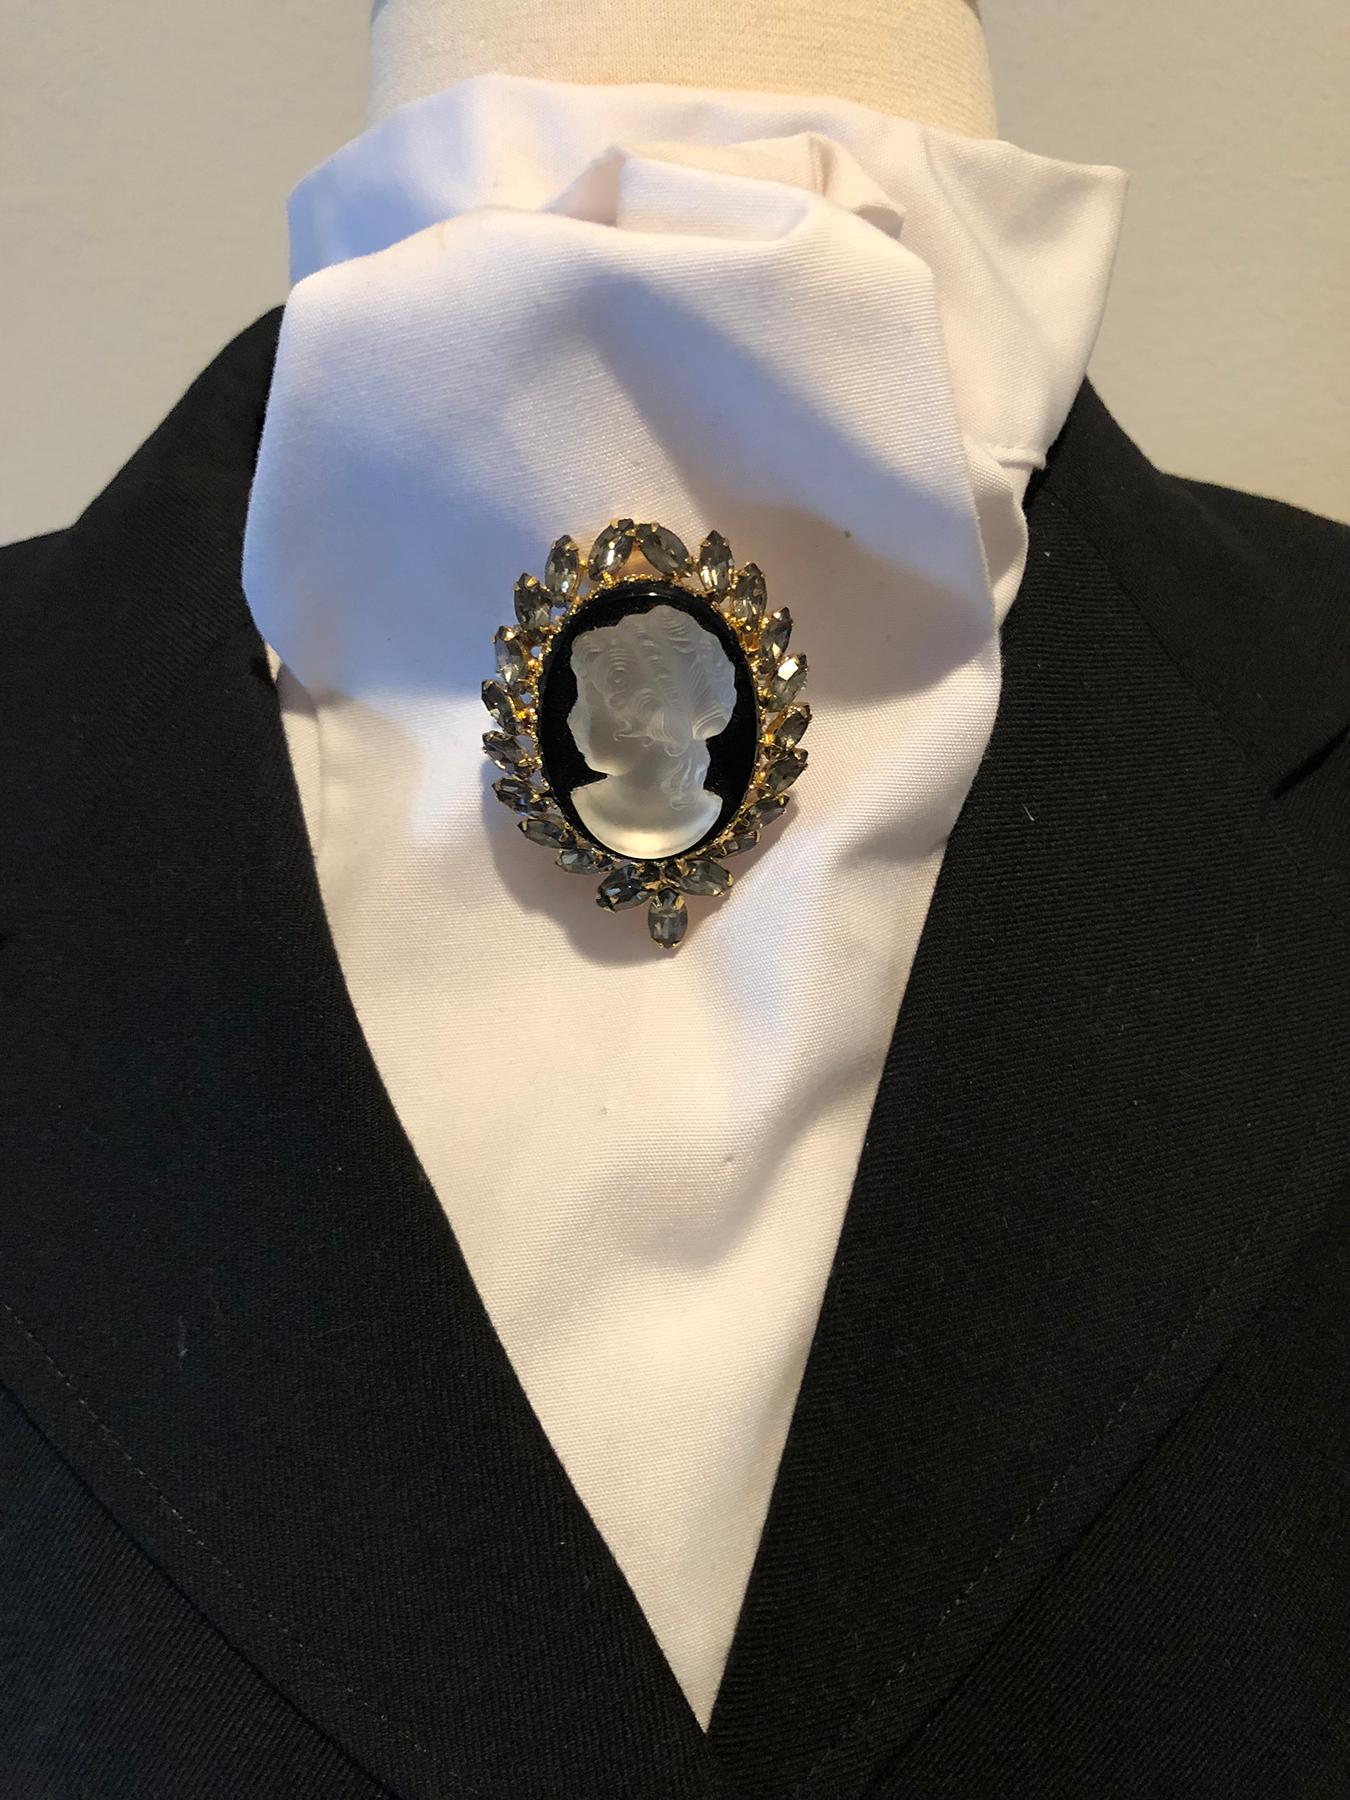 Dressage stock tie pin